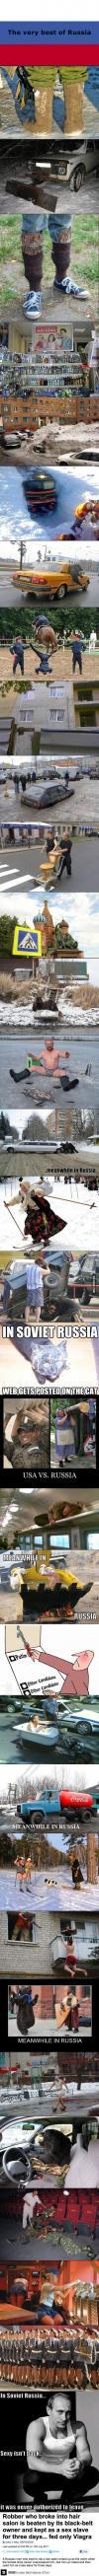 soviet russia, wtf, compilation, long, lol